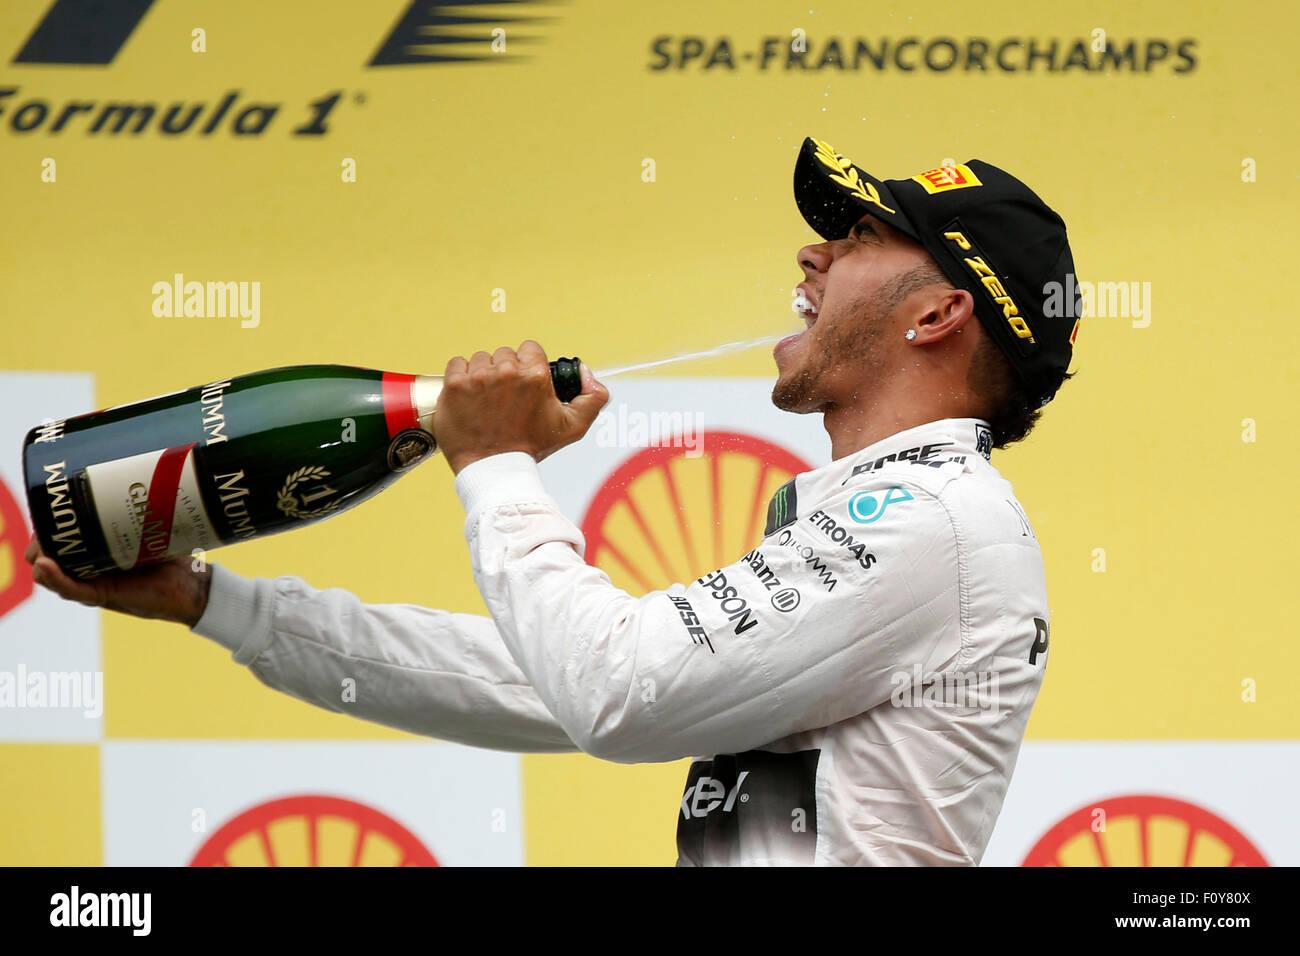 Spa, Belgien. 23. August 2015. FIA Formula One World Championship 2015, Grand Prix von Belgien, #44 Lewis Hamilton Stockbild